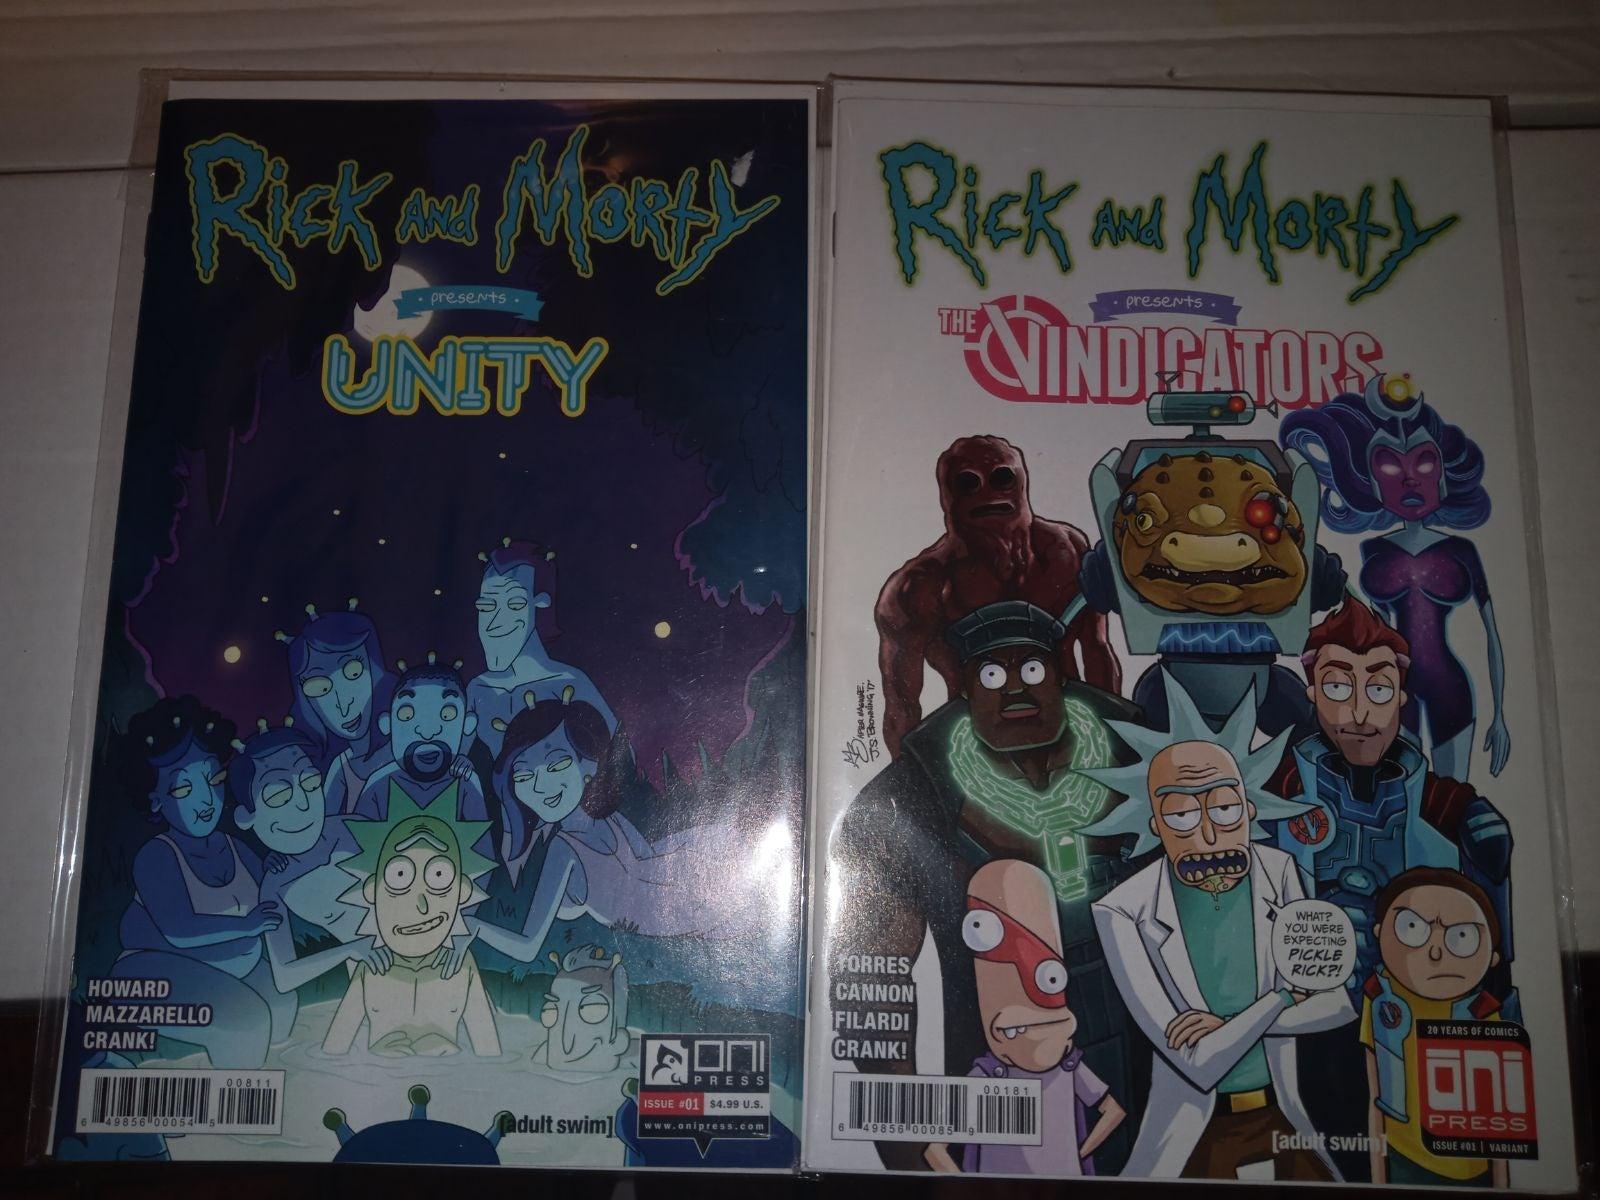 Rick and Morty comic books